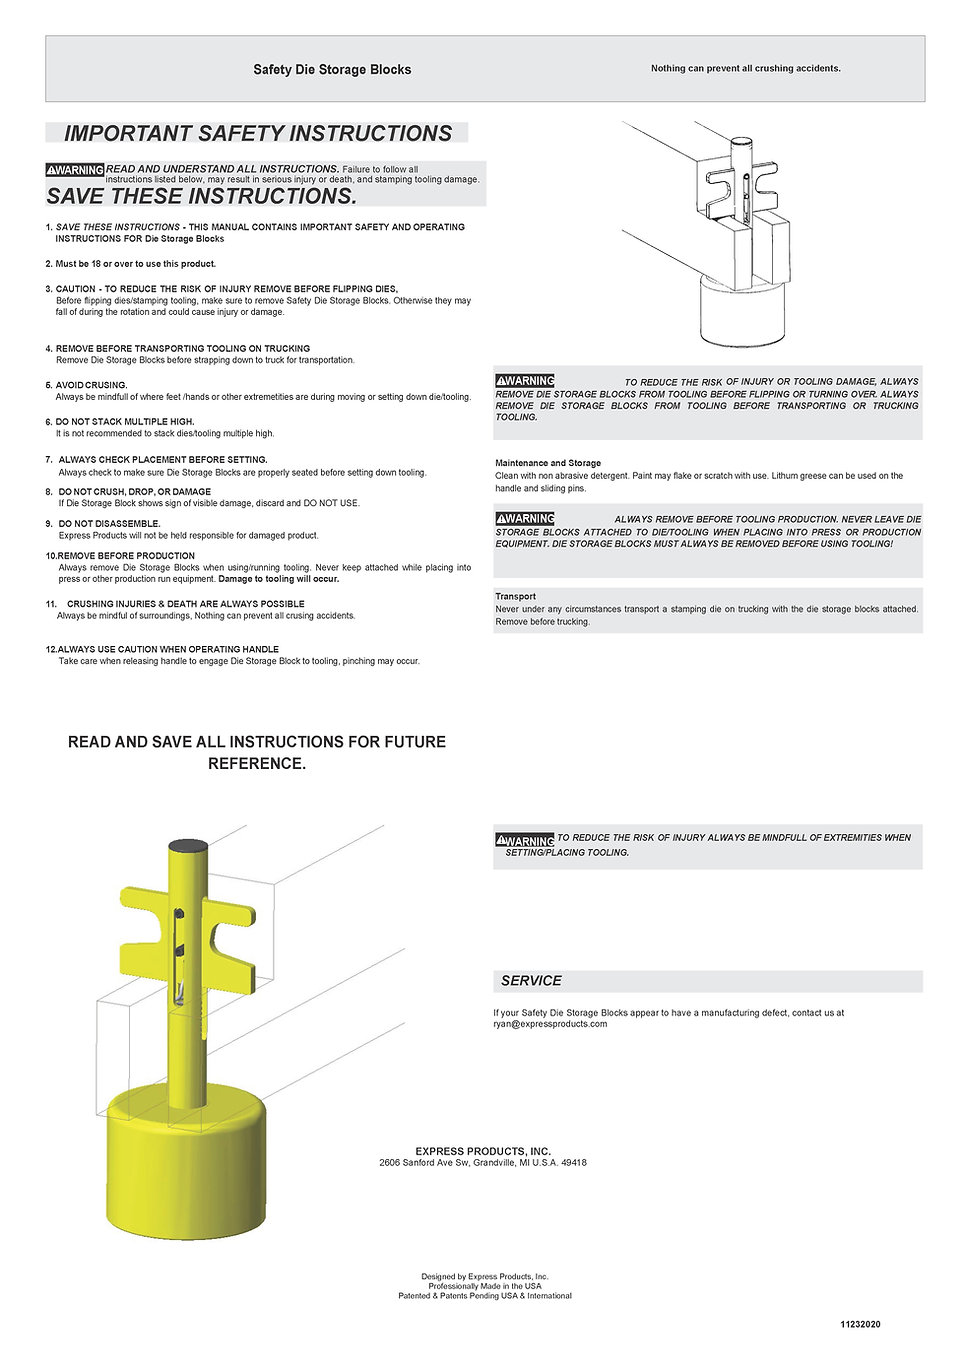 safety instructions.jpg